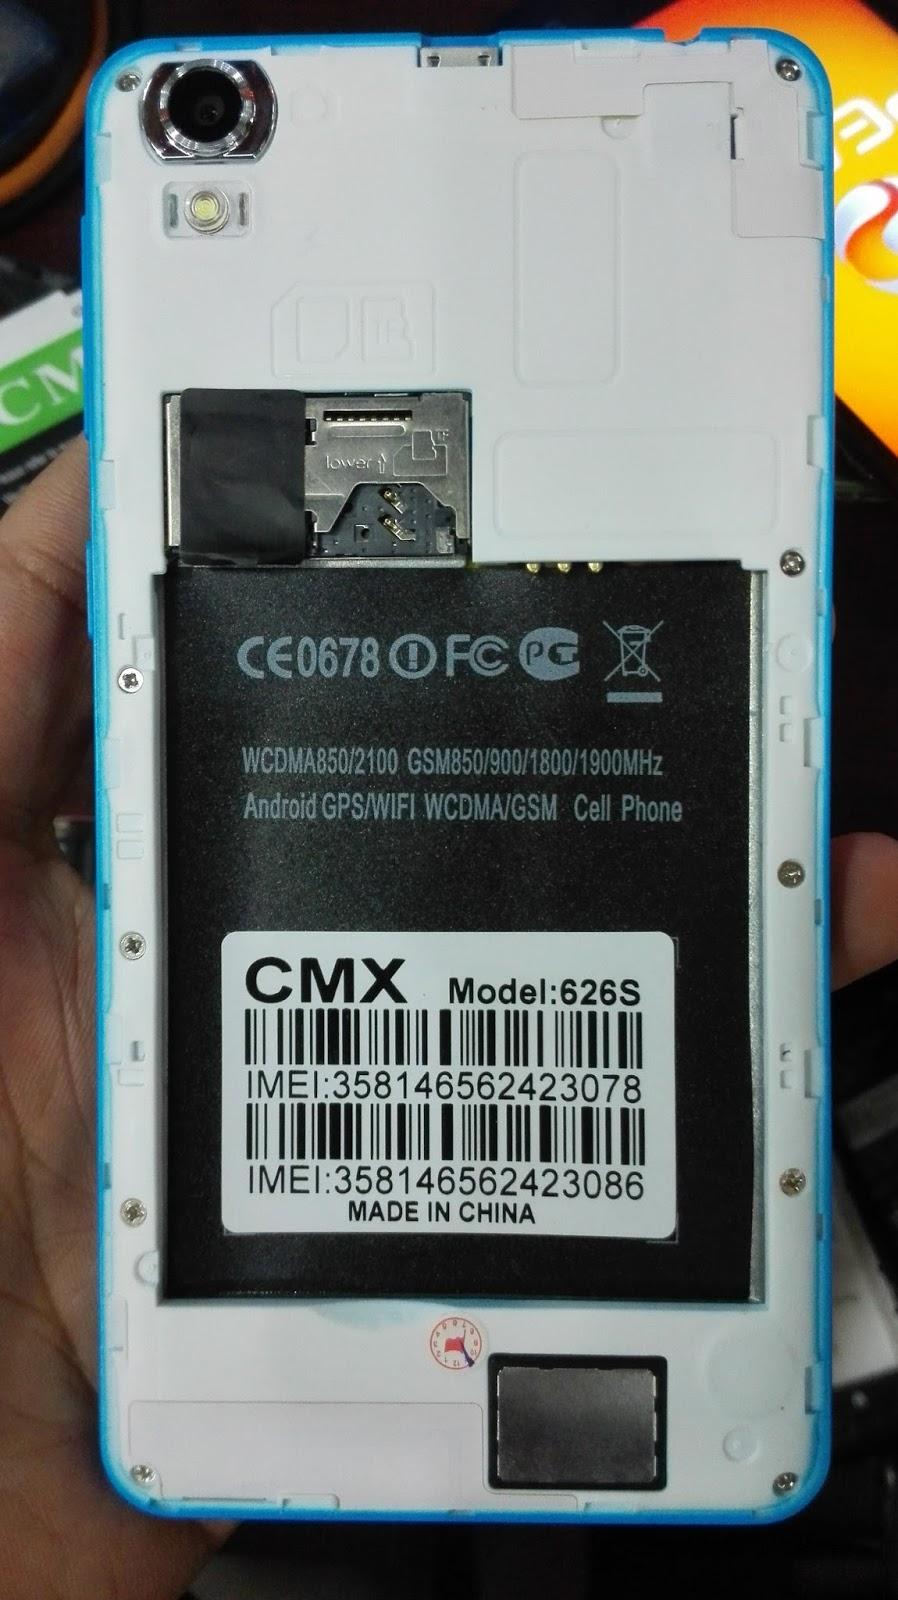 Download HTC CMX 626s 5 0 1 Stock Firmware(Flashfile) | Tecpharmacy